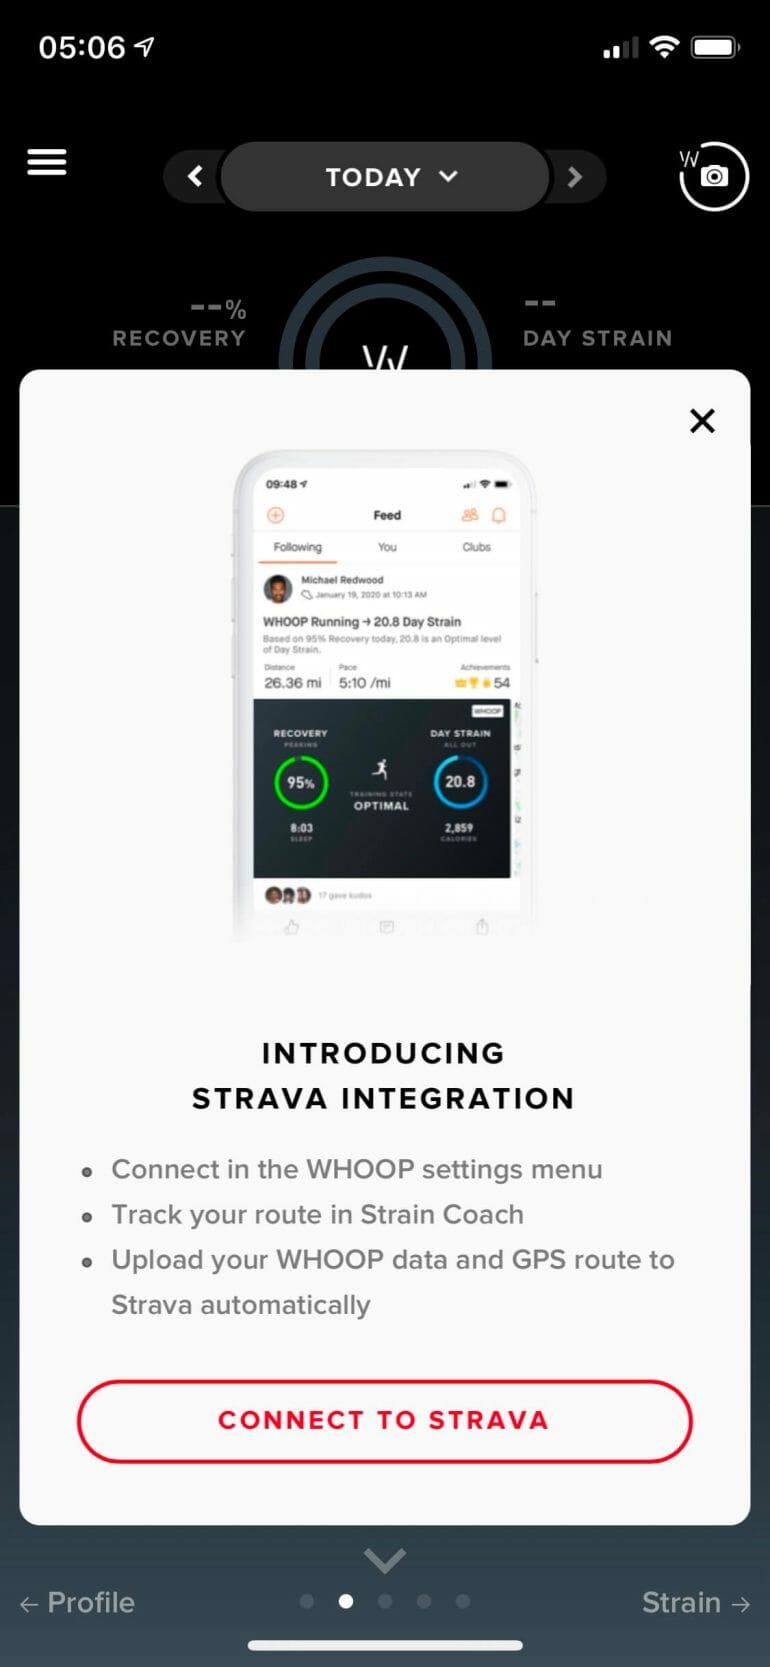 WHOOP - Strava Integration